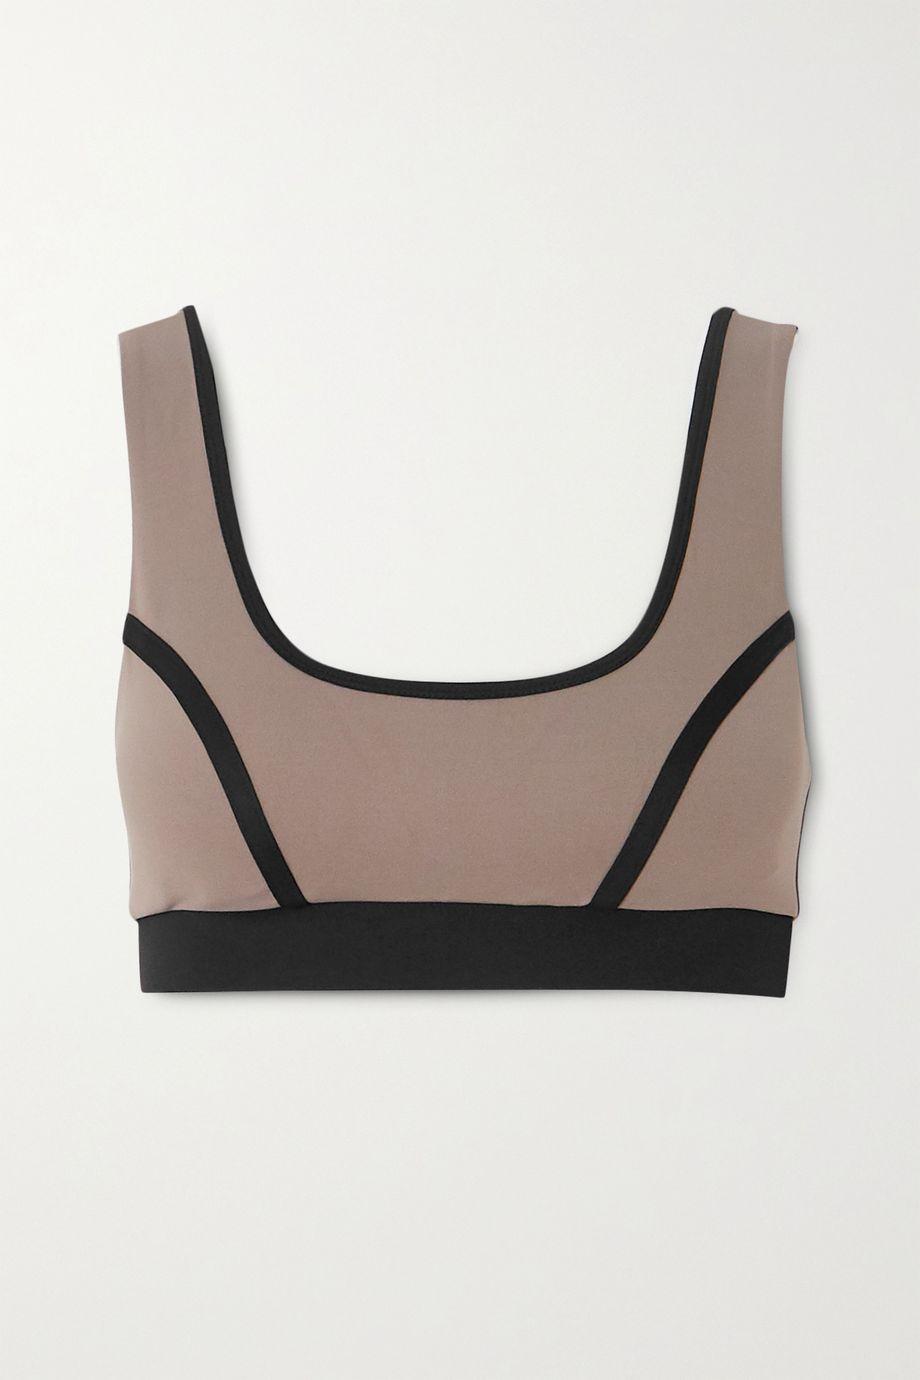 Ernest Leoty Blandine paneled stretch sports bra